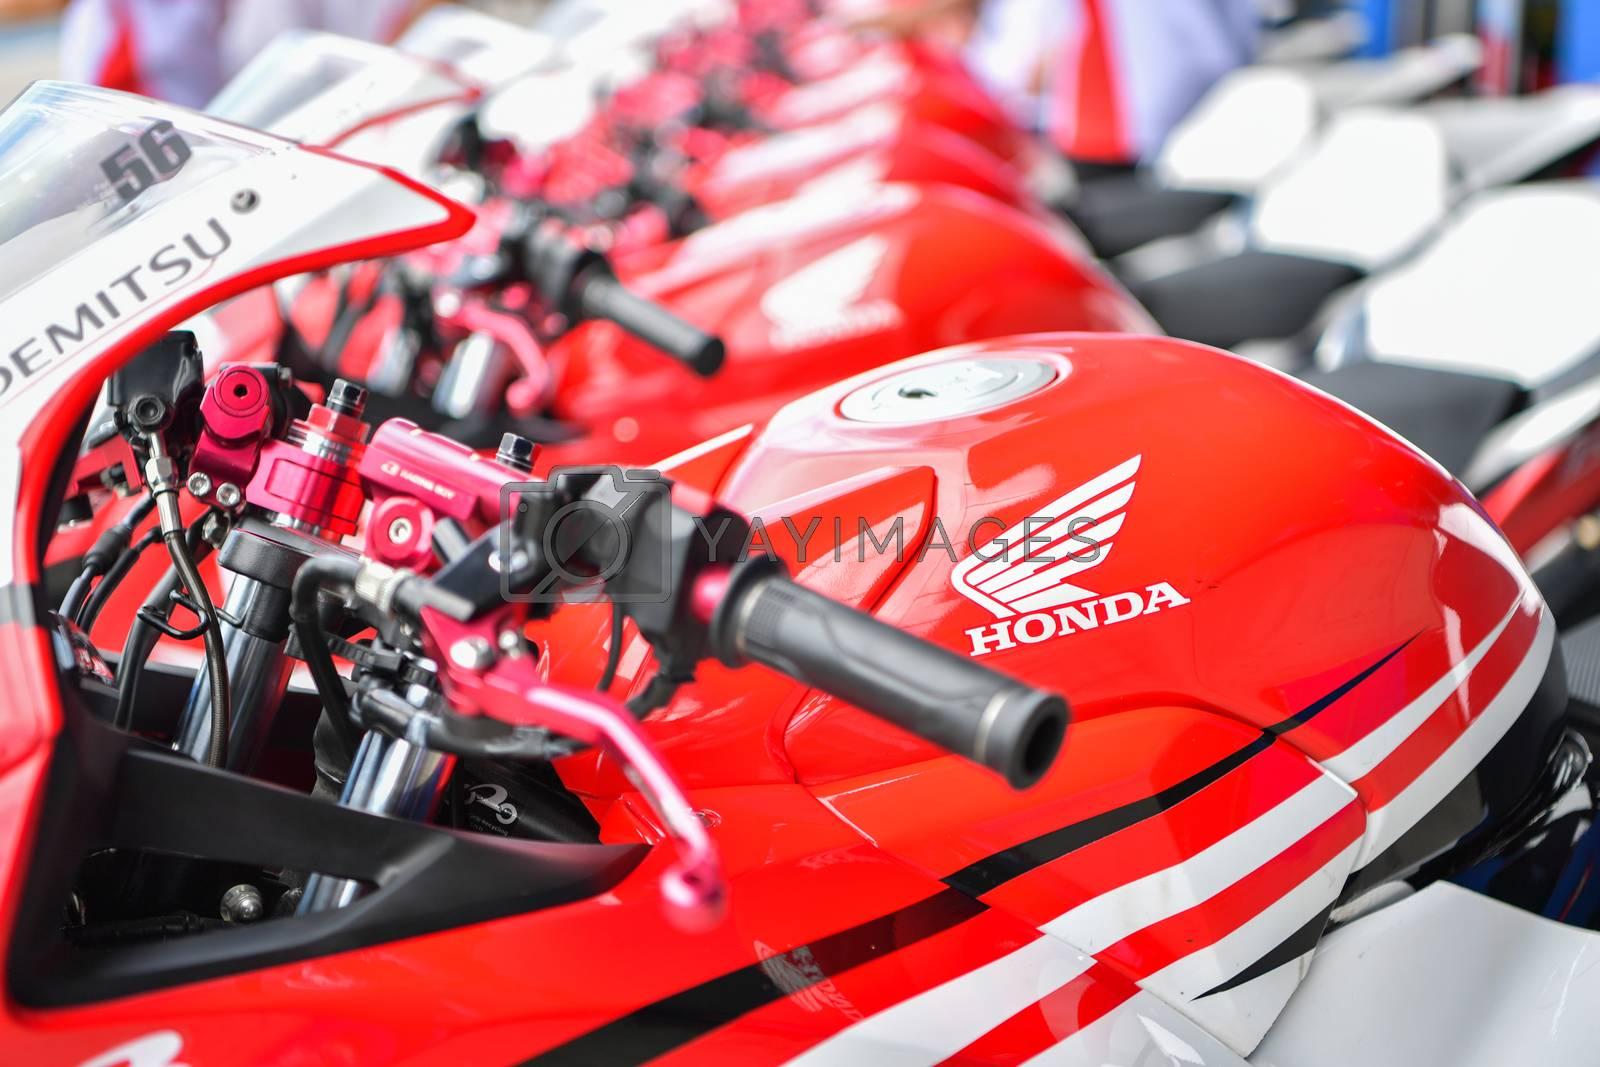 BURIRAM - DECEMBER 4 : Honda CBR300R motorcycle in Asia Road Racing Championship 2016 Round 6 at Chang International Racing Circuit on December 4, 2016, Buriram, Thailand.